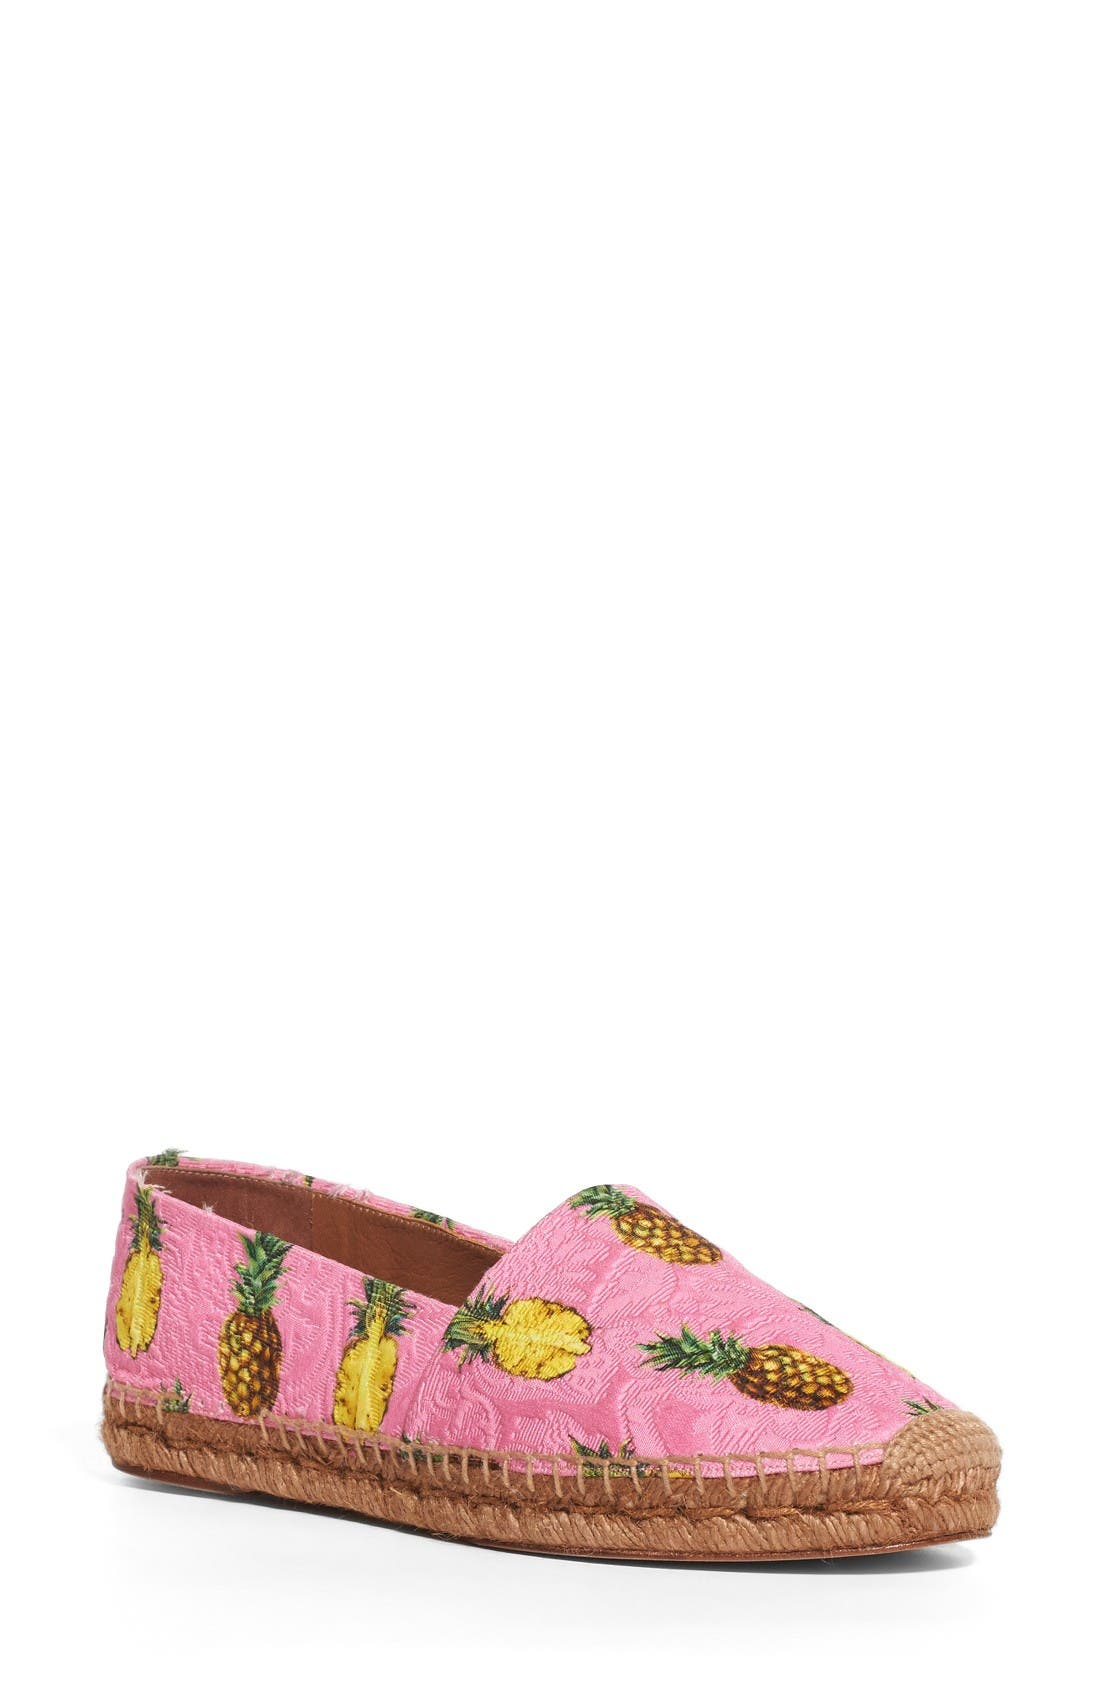 Alternate Image 1 Selected - Dolce&Gabbana Pineapple Print Espadrille Flat (Women)